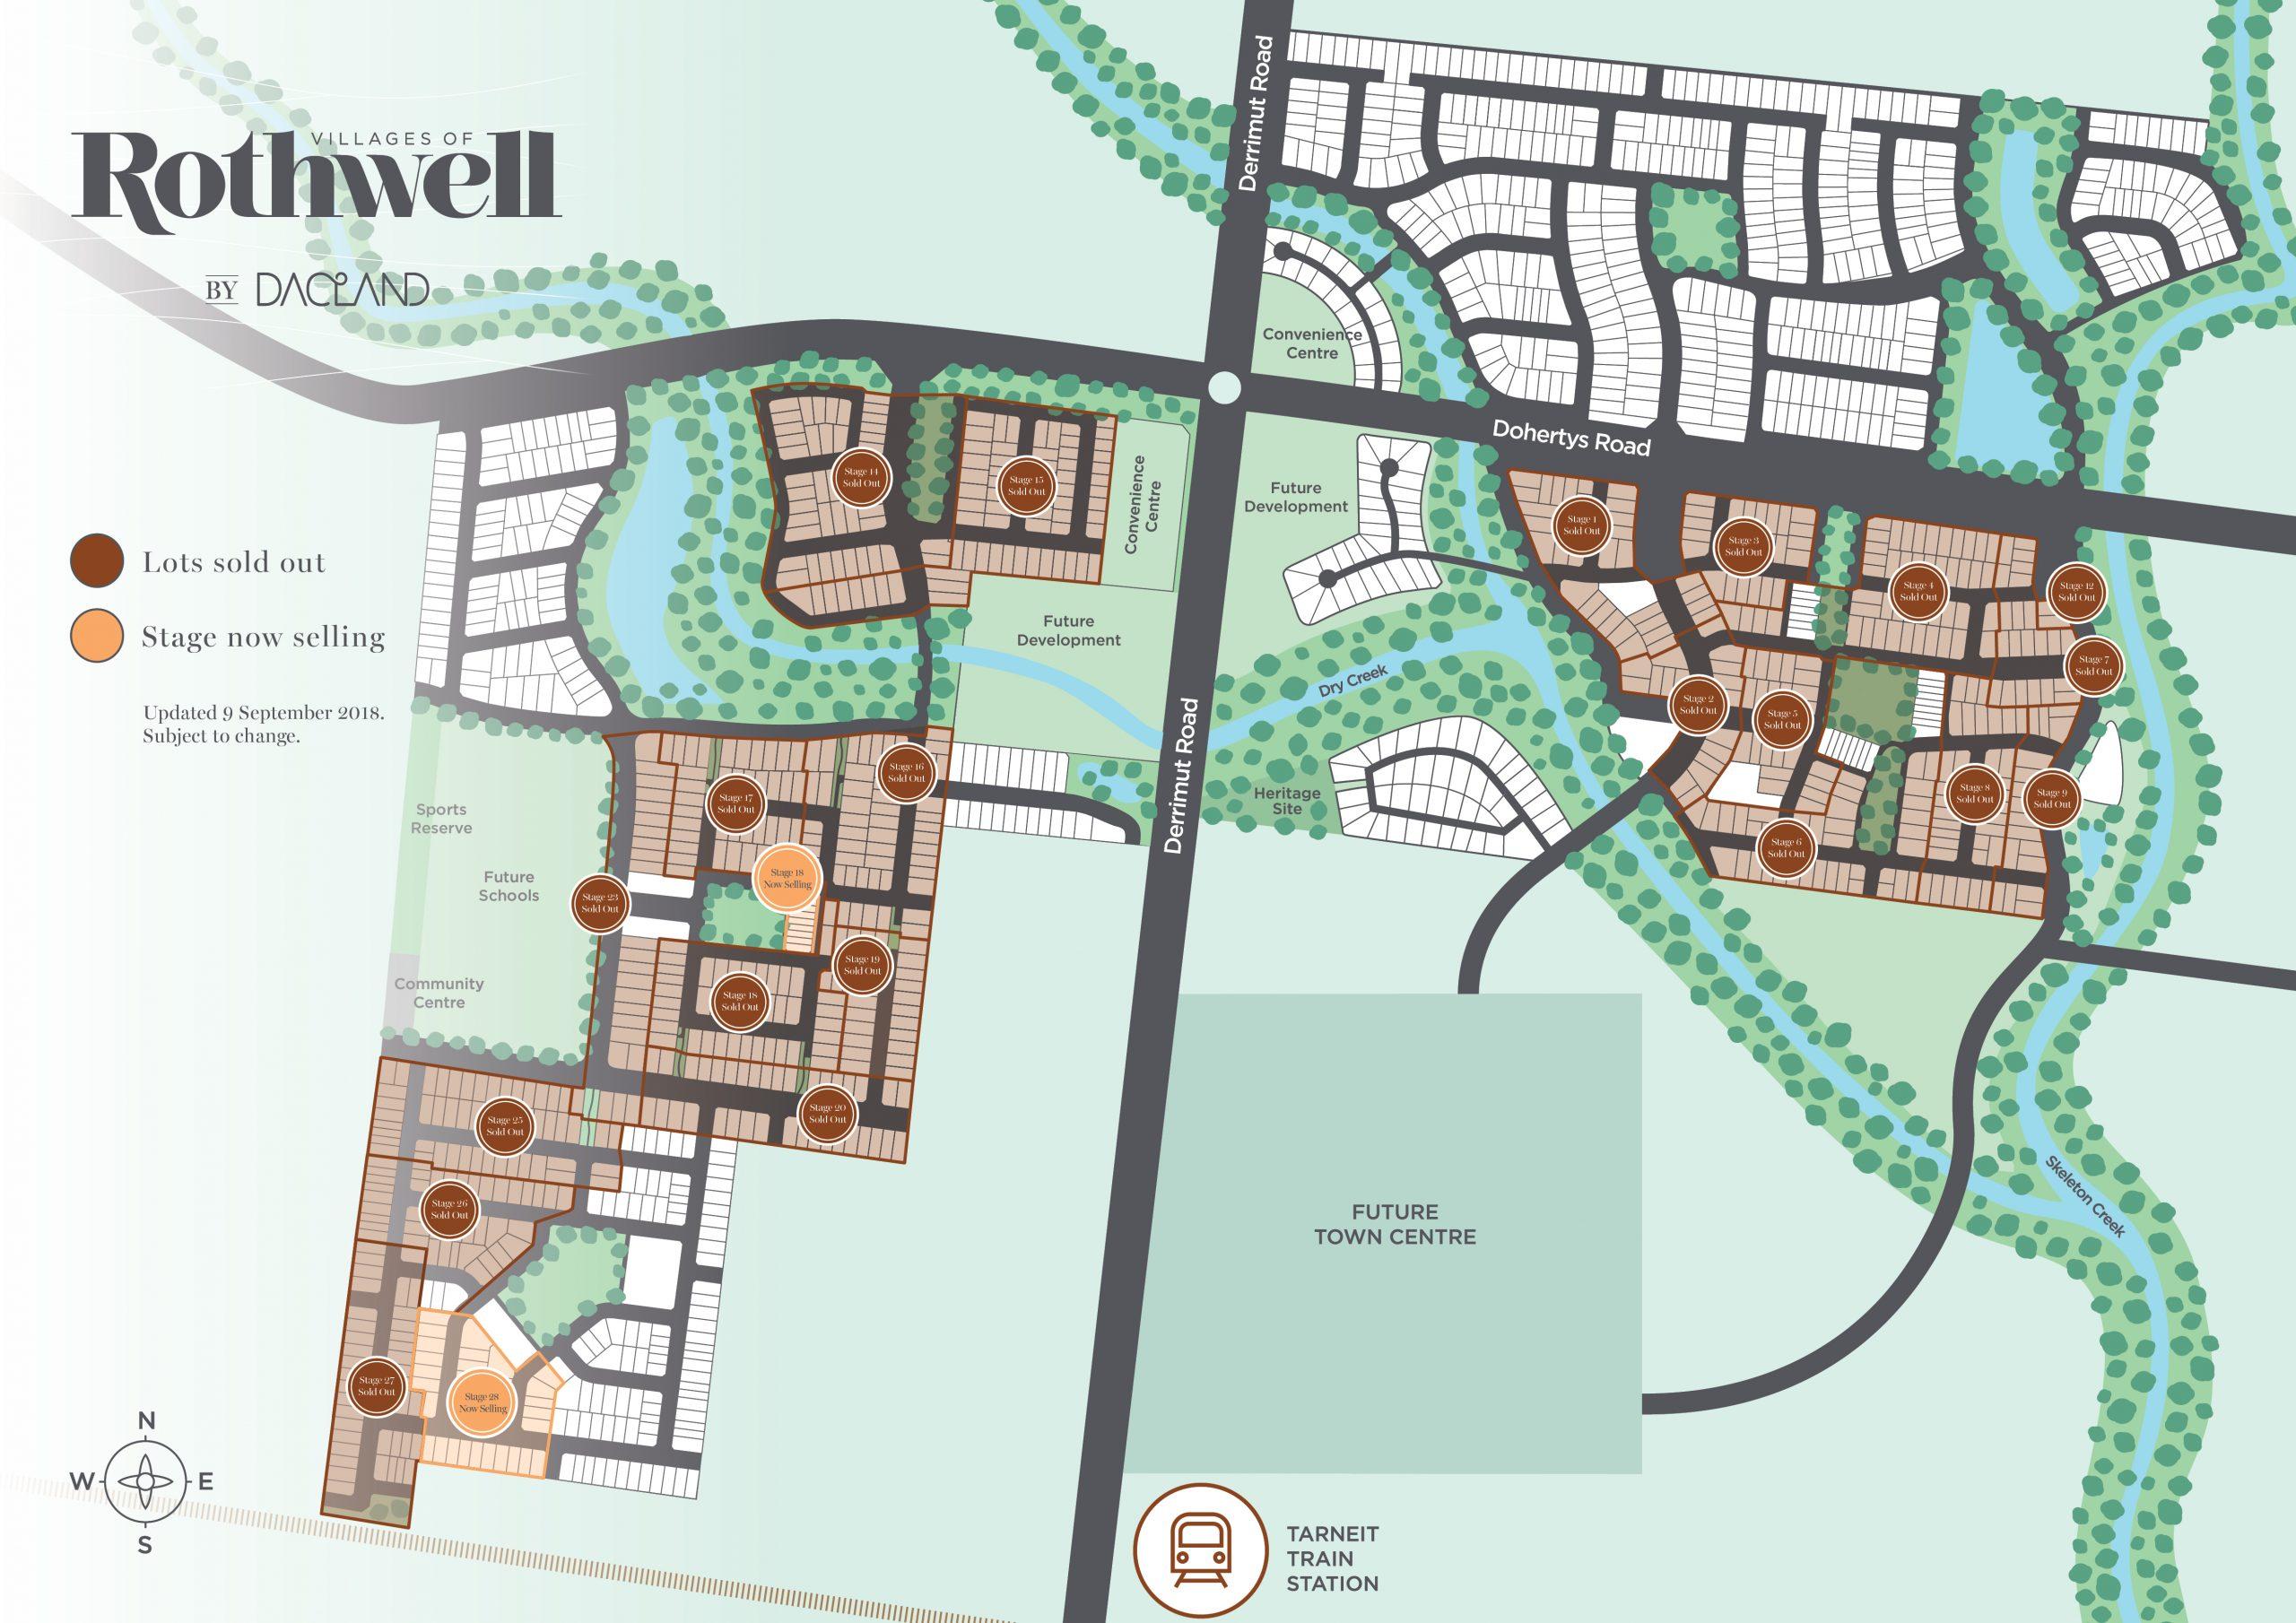 TARW0014-Rothwell-Website-Masterplan